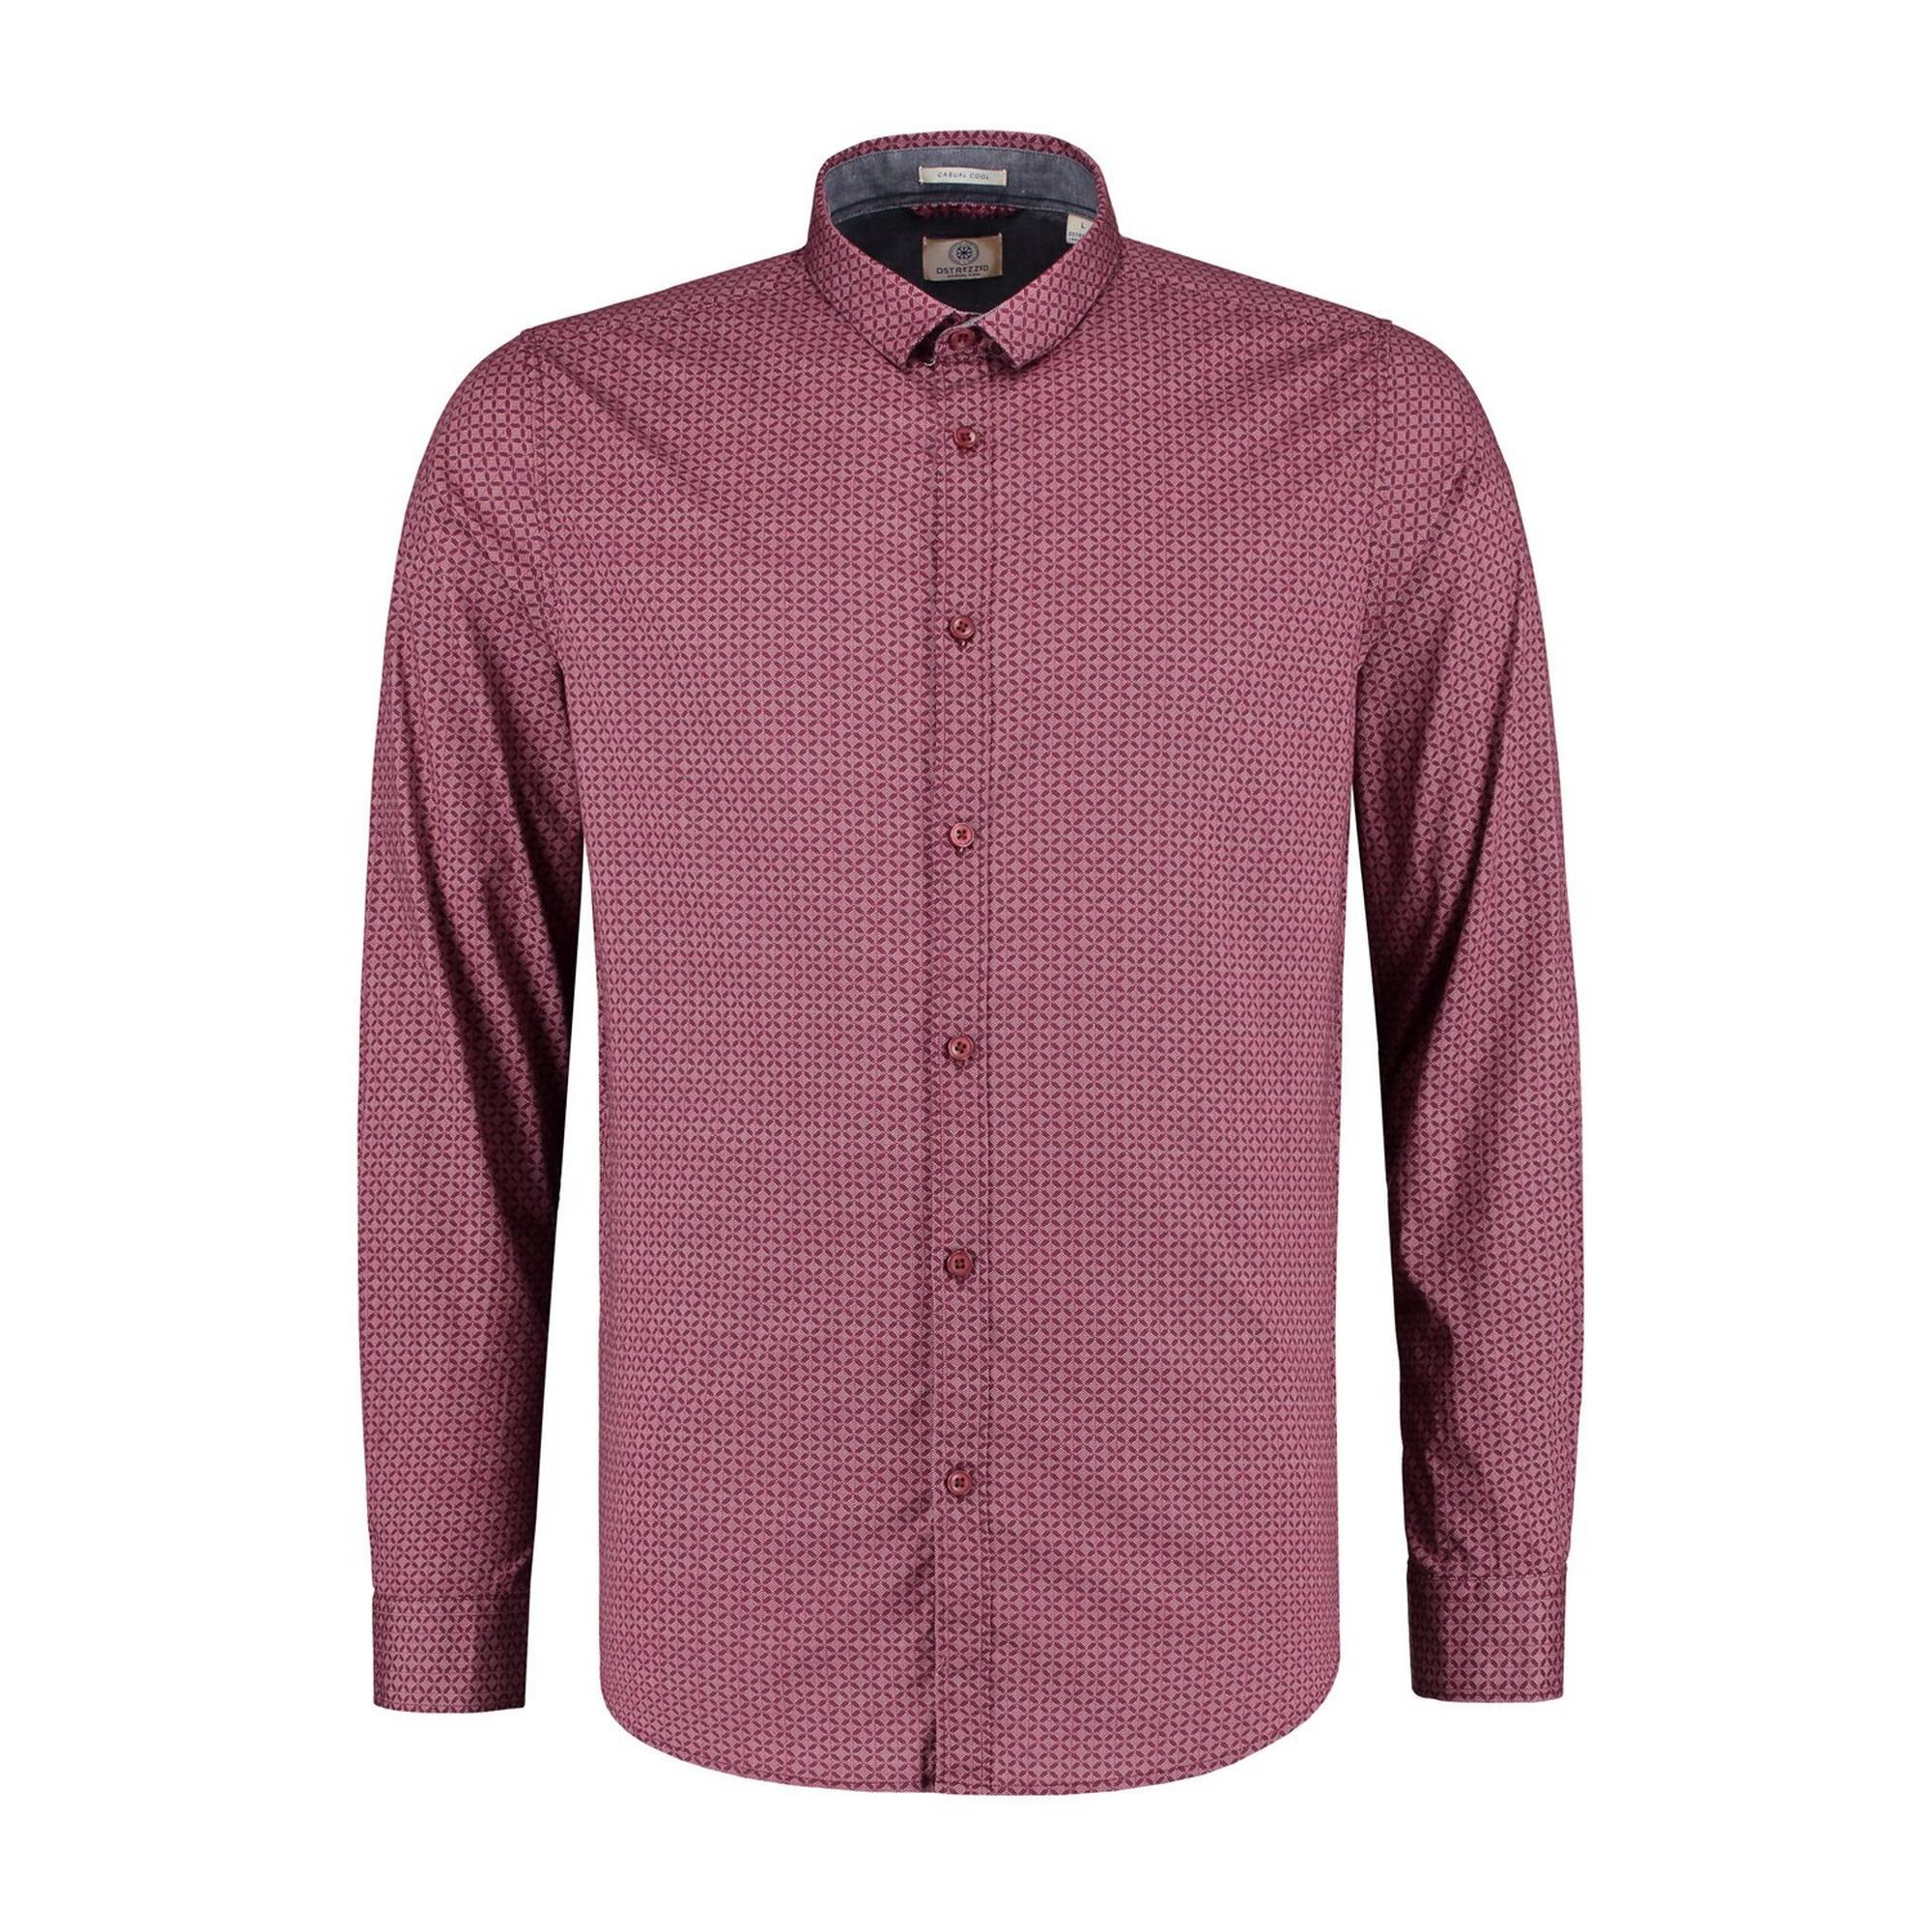 Men's Diamond Dot Stretch Poplin Woven Long Sleeve Shirt